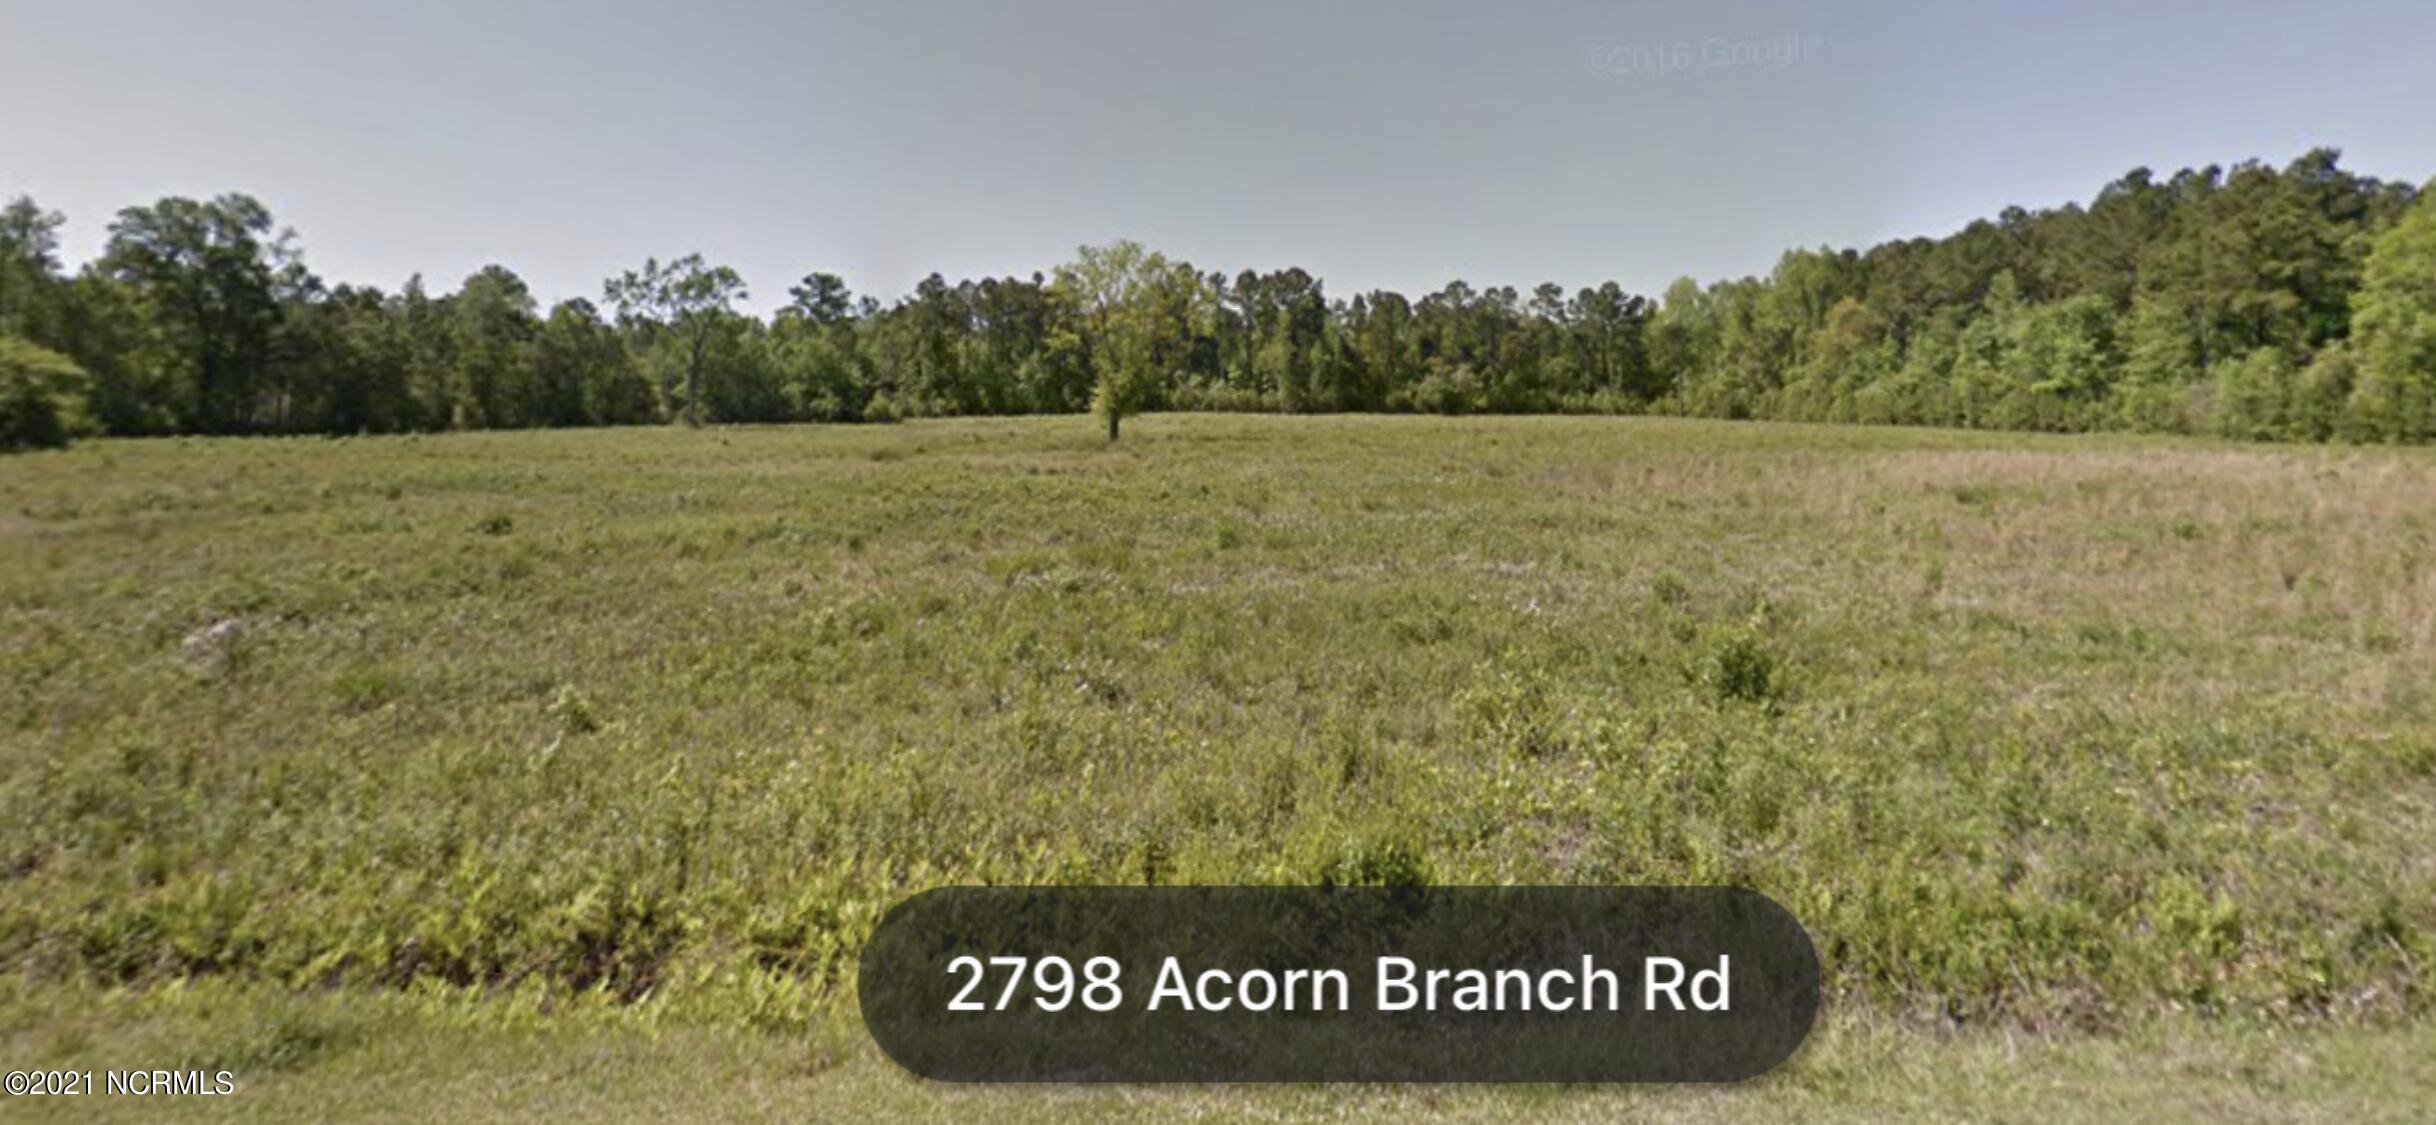 2800 Acorn Branch Road, Wilmington, North Carolina 28405, ,Farm,For sale,Acorn Branch Road,100279303